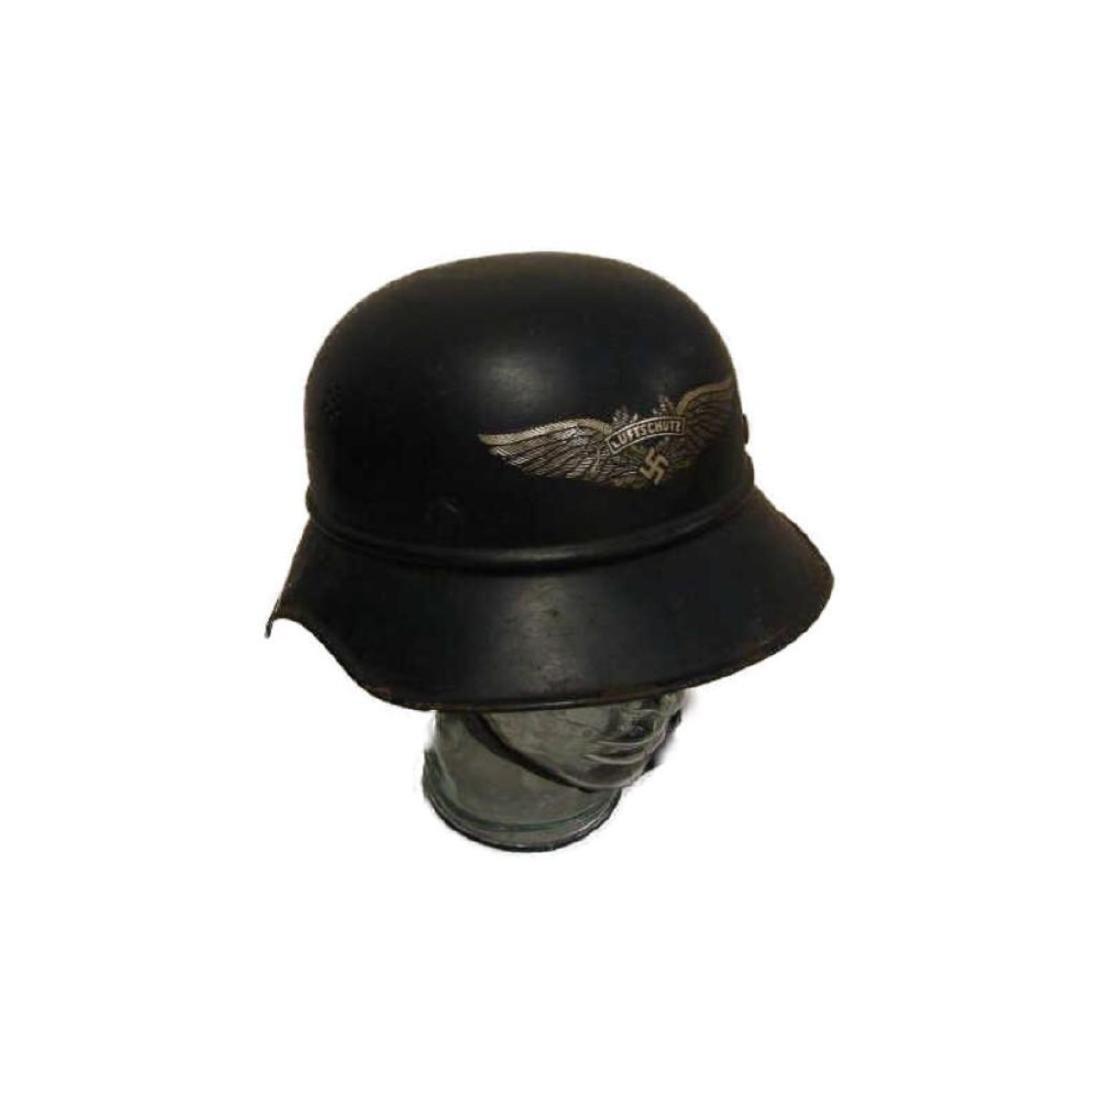 WWII Nazi German Luftschutz Helmet